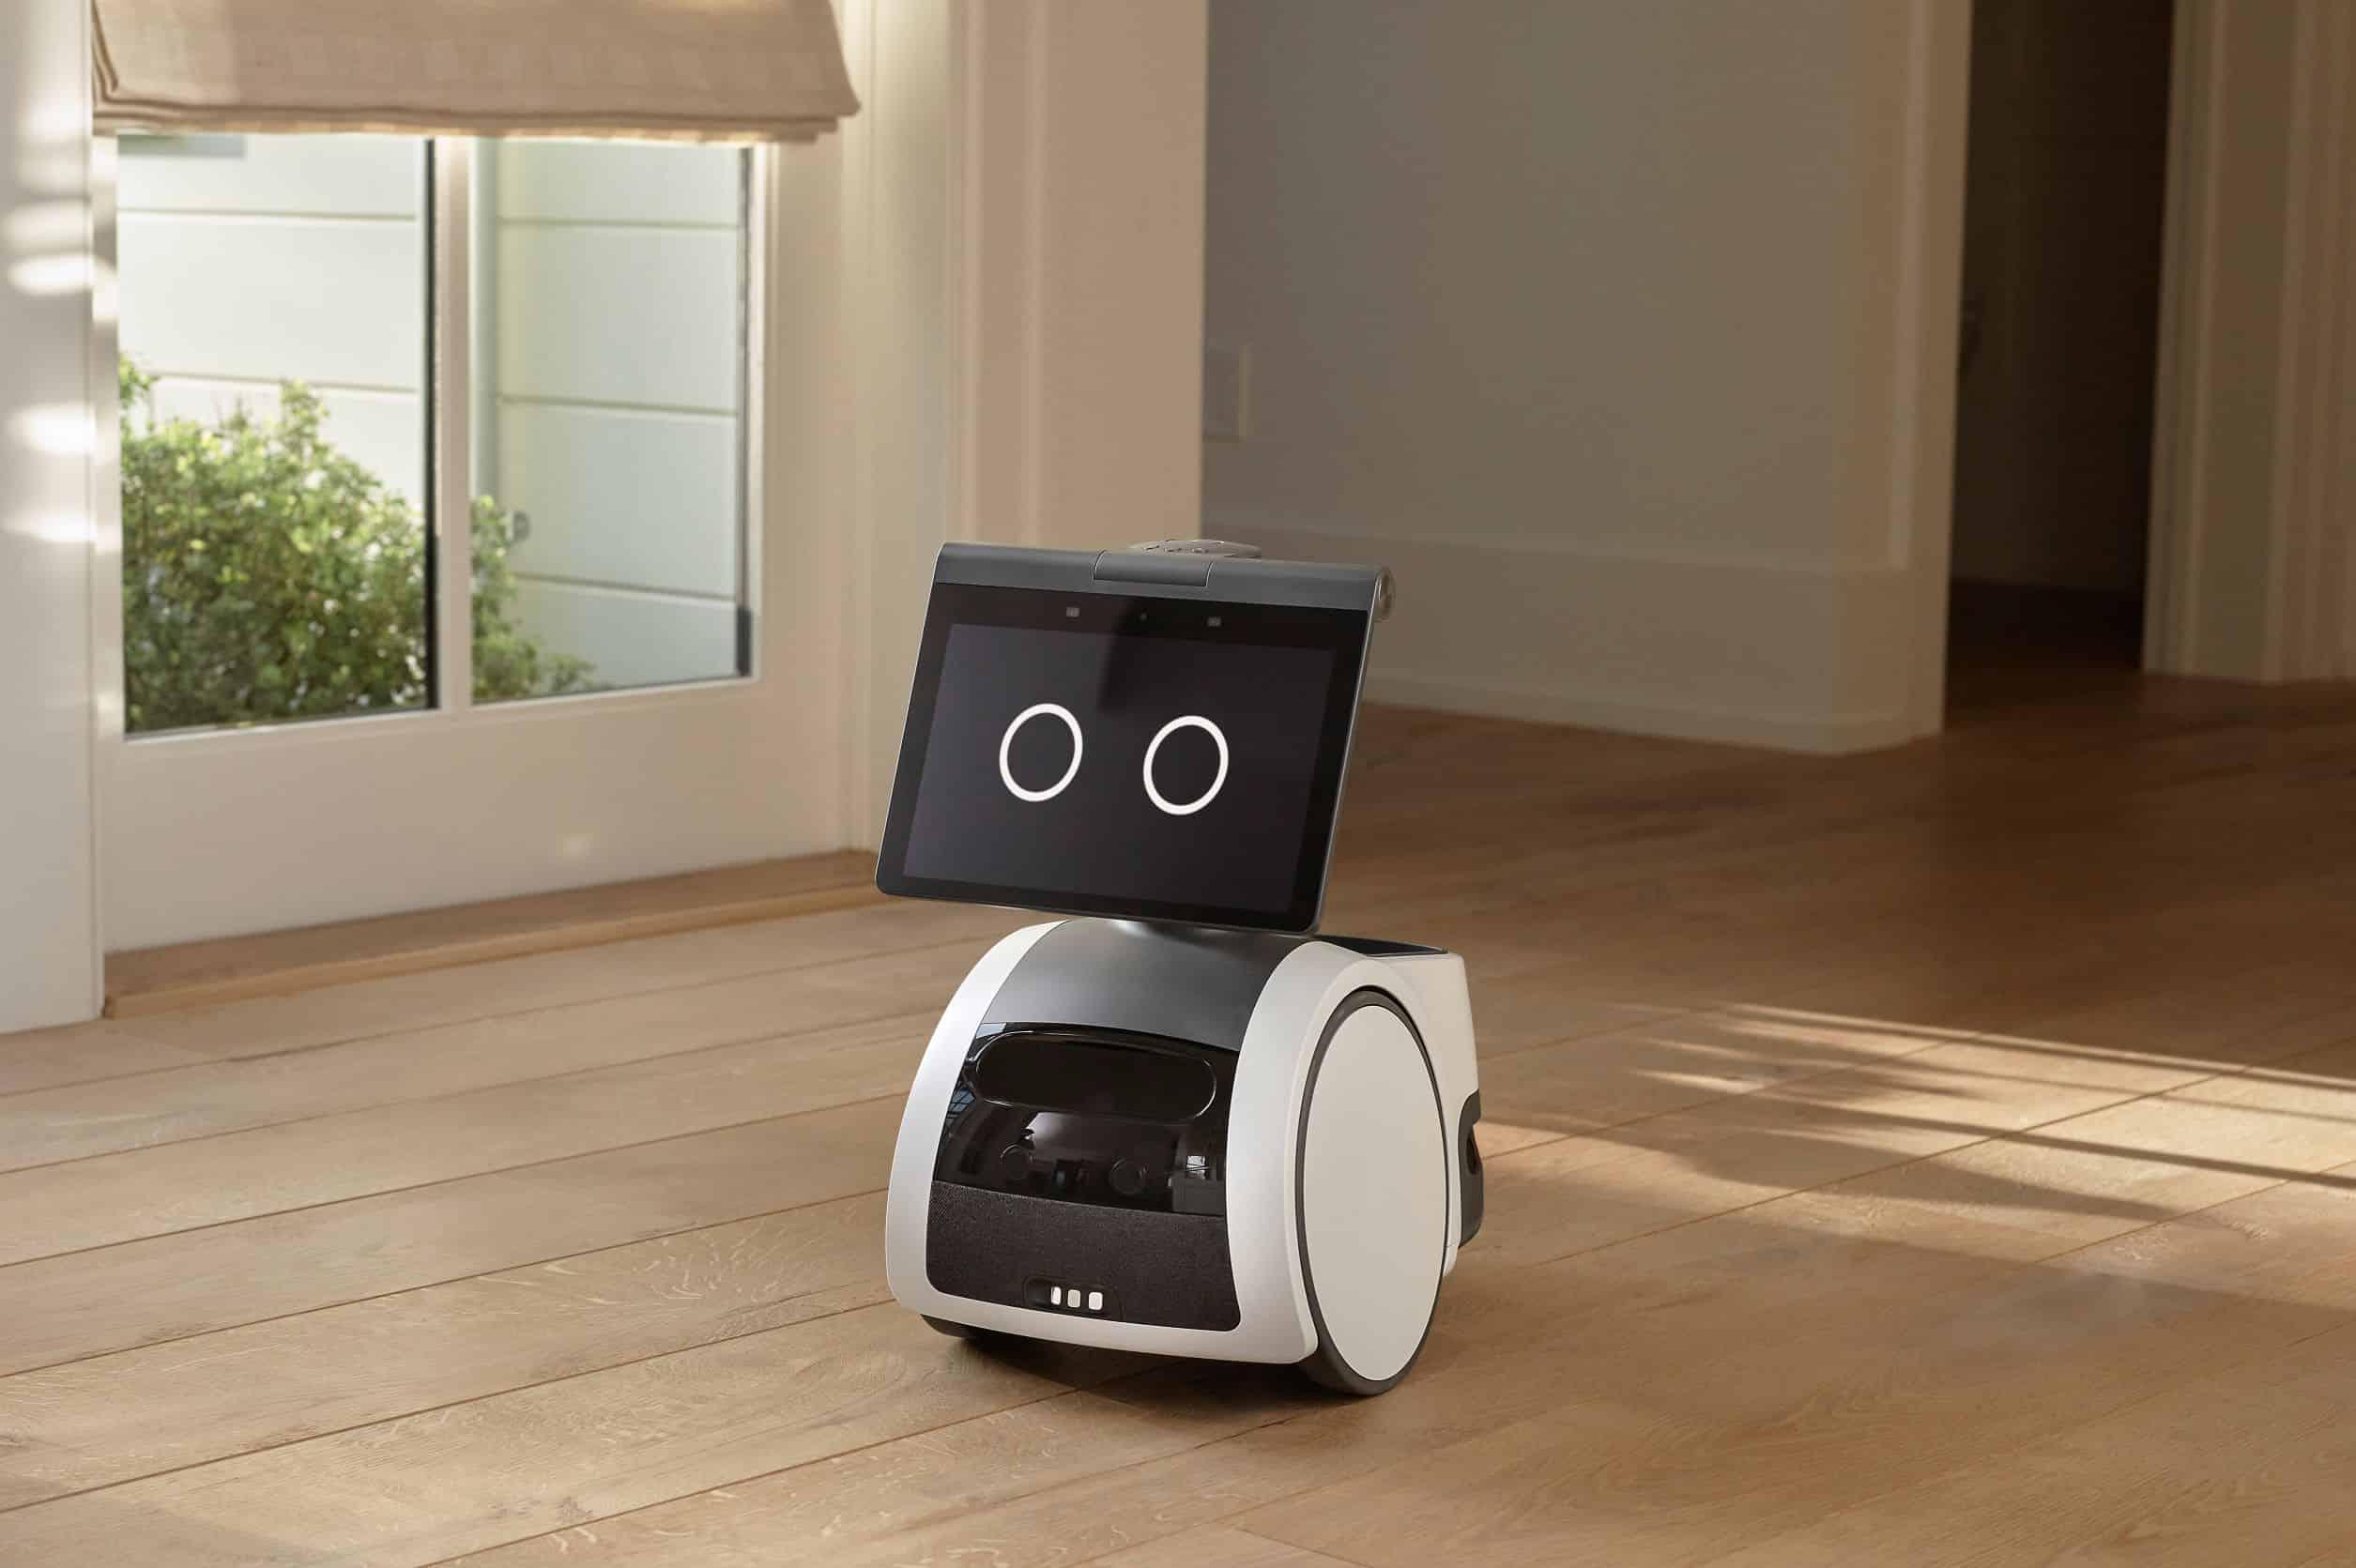 Astro Home Robot. (Photo: Amazon)